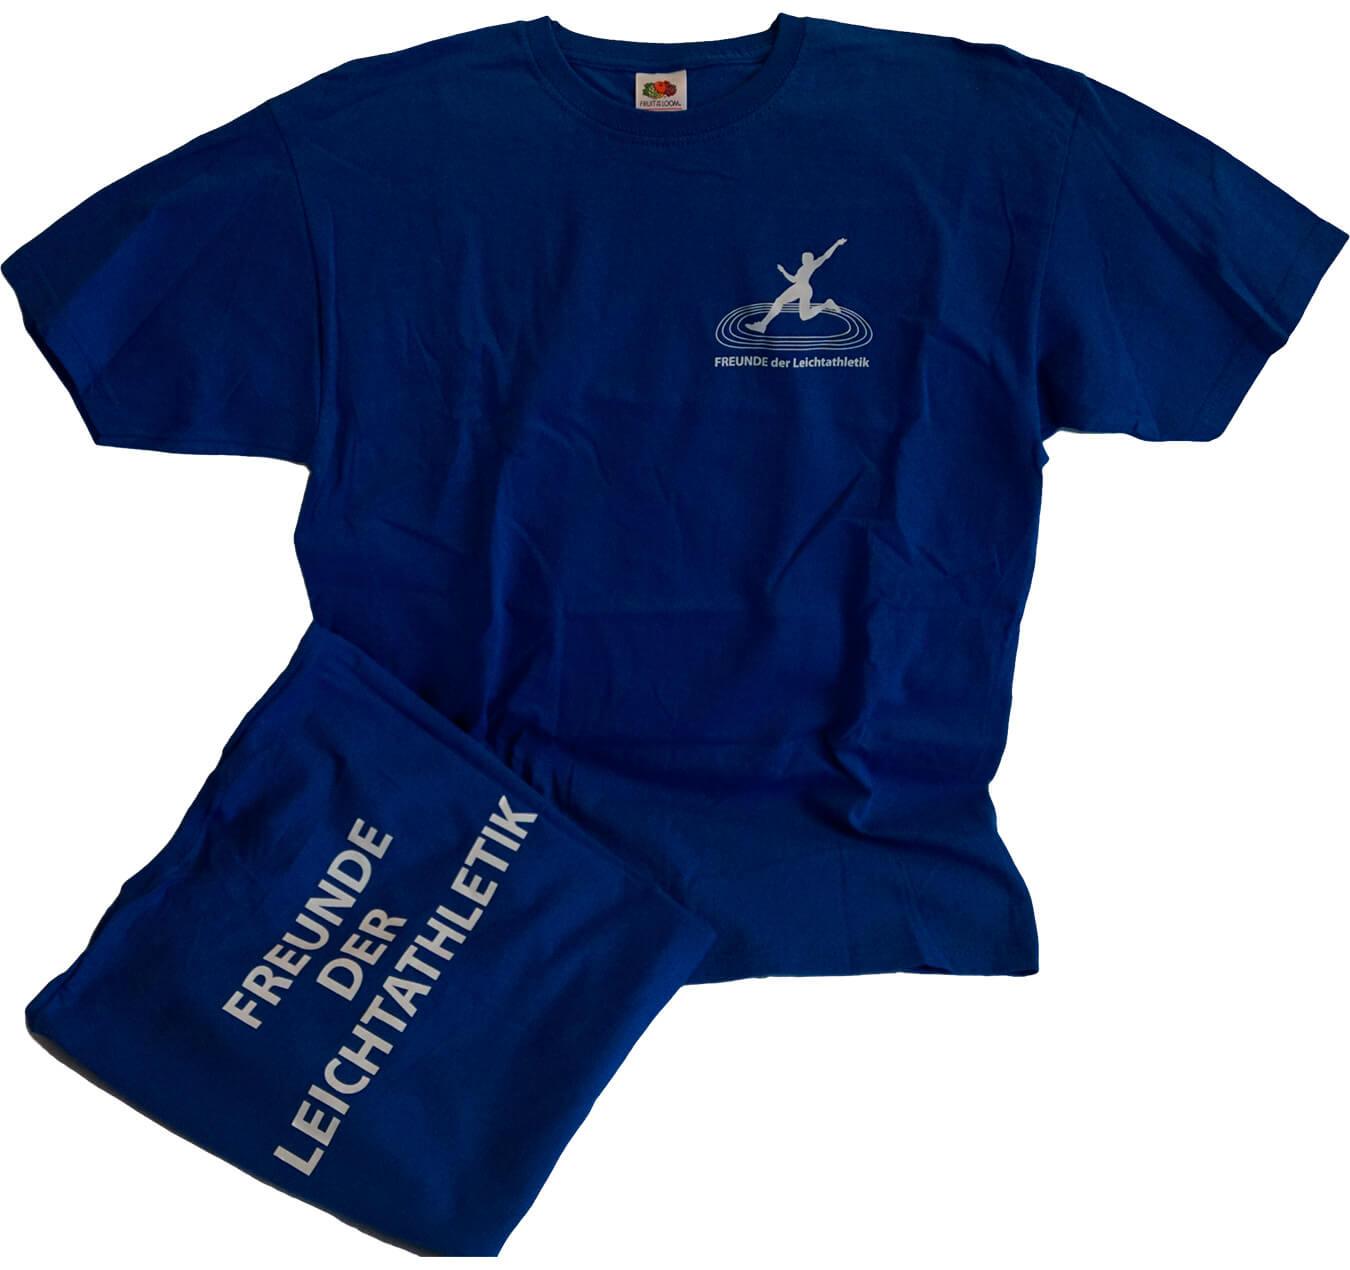 FREUNDE-Accessoires – T-Shirt